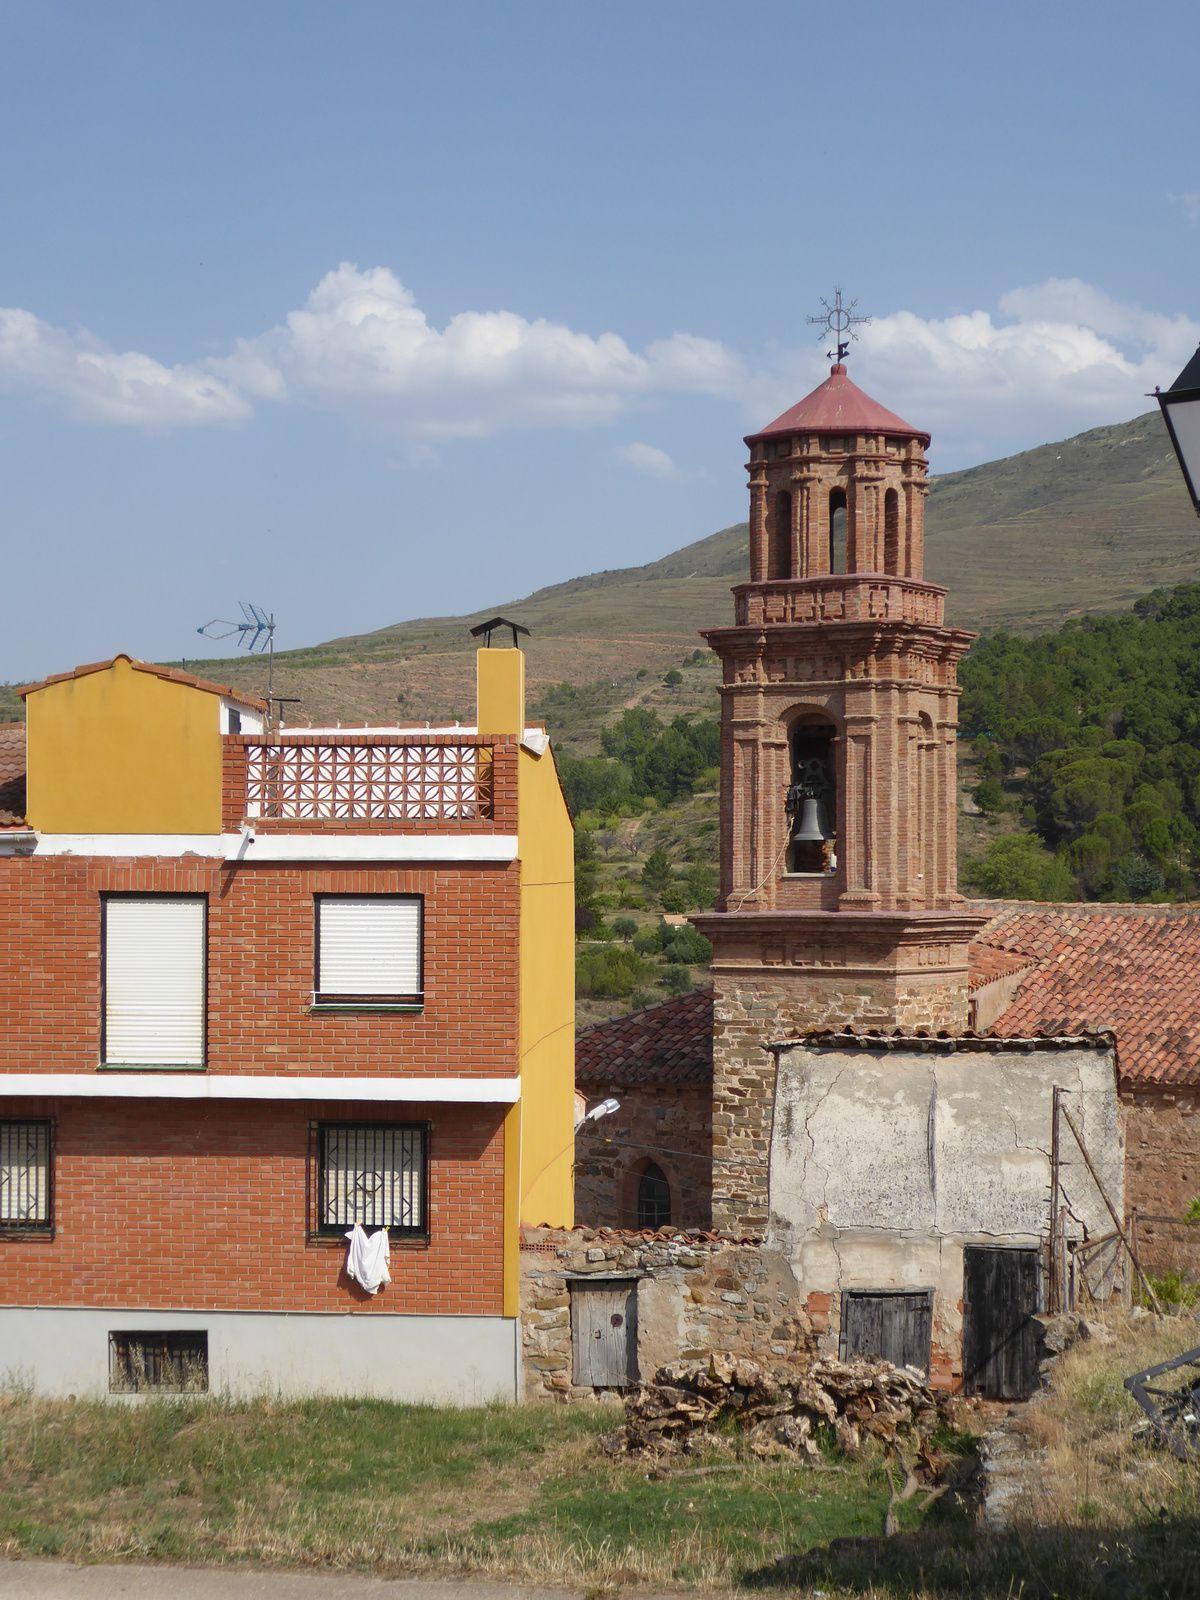 Espagne 2019 #9 Arnedo et Prejano